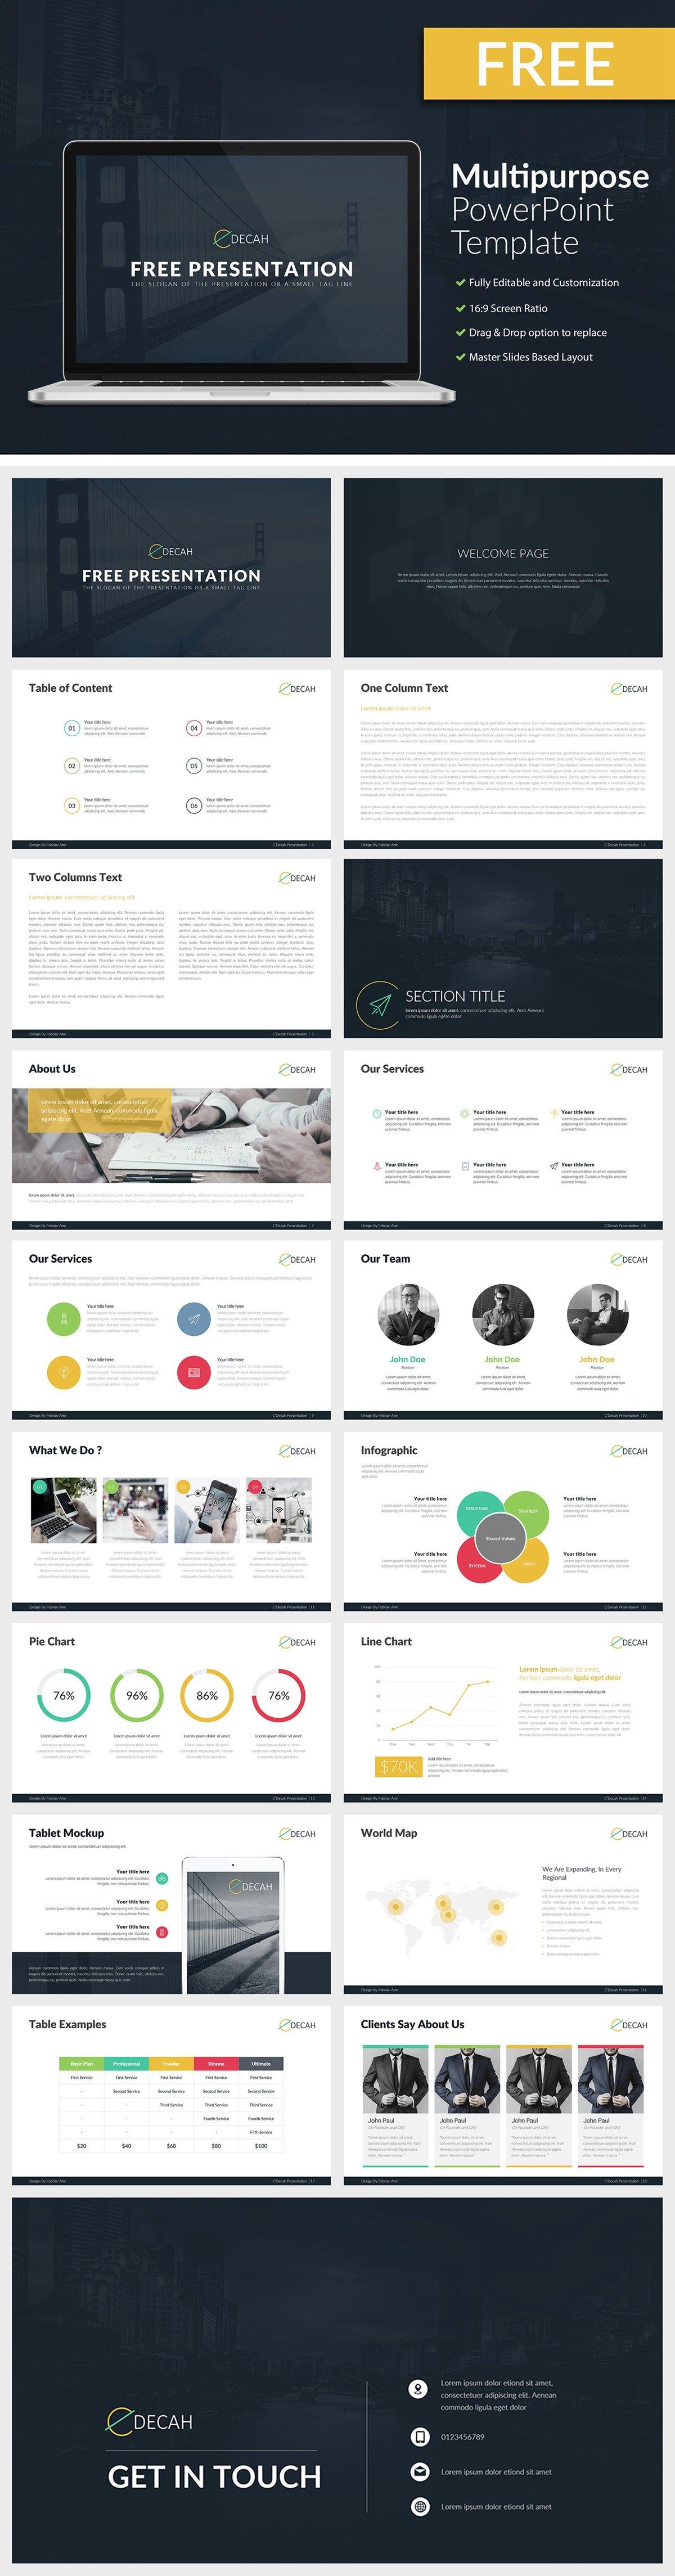 CDECAH Free Multipurpose PowerPoint Template - C'DECAH - Free Multipurpose PowerPoint Template - world map, startup, Multipurpose, mockup, Business